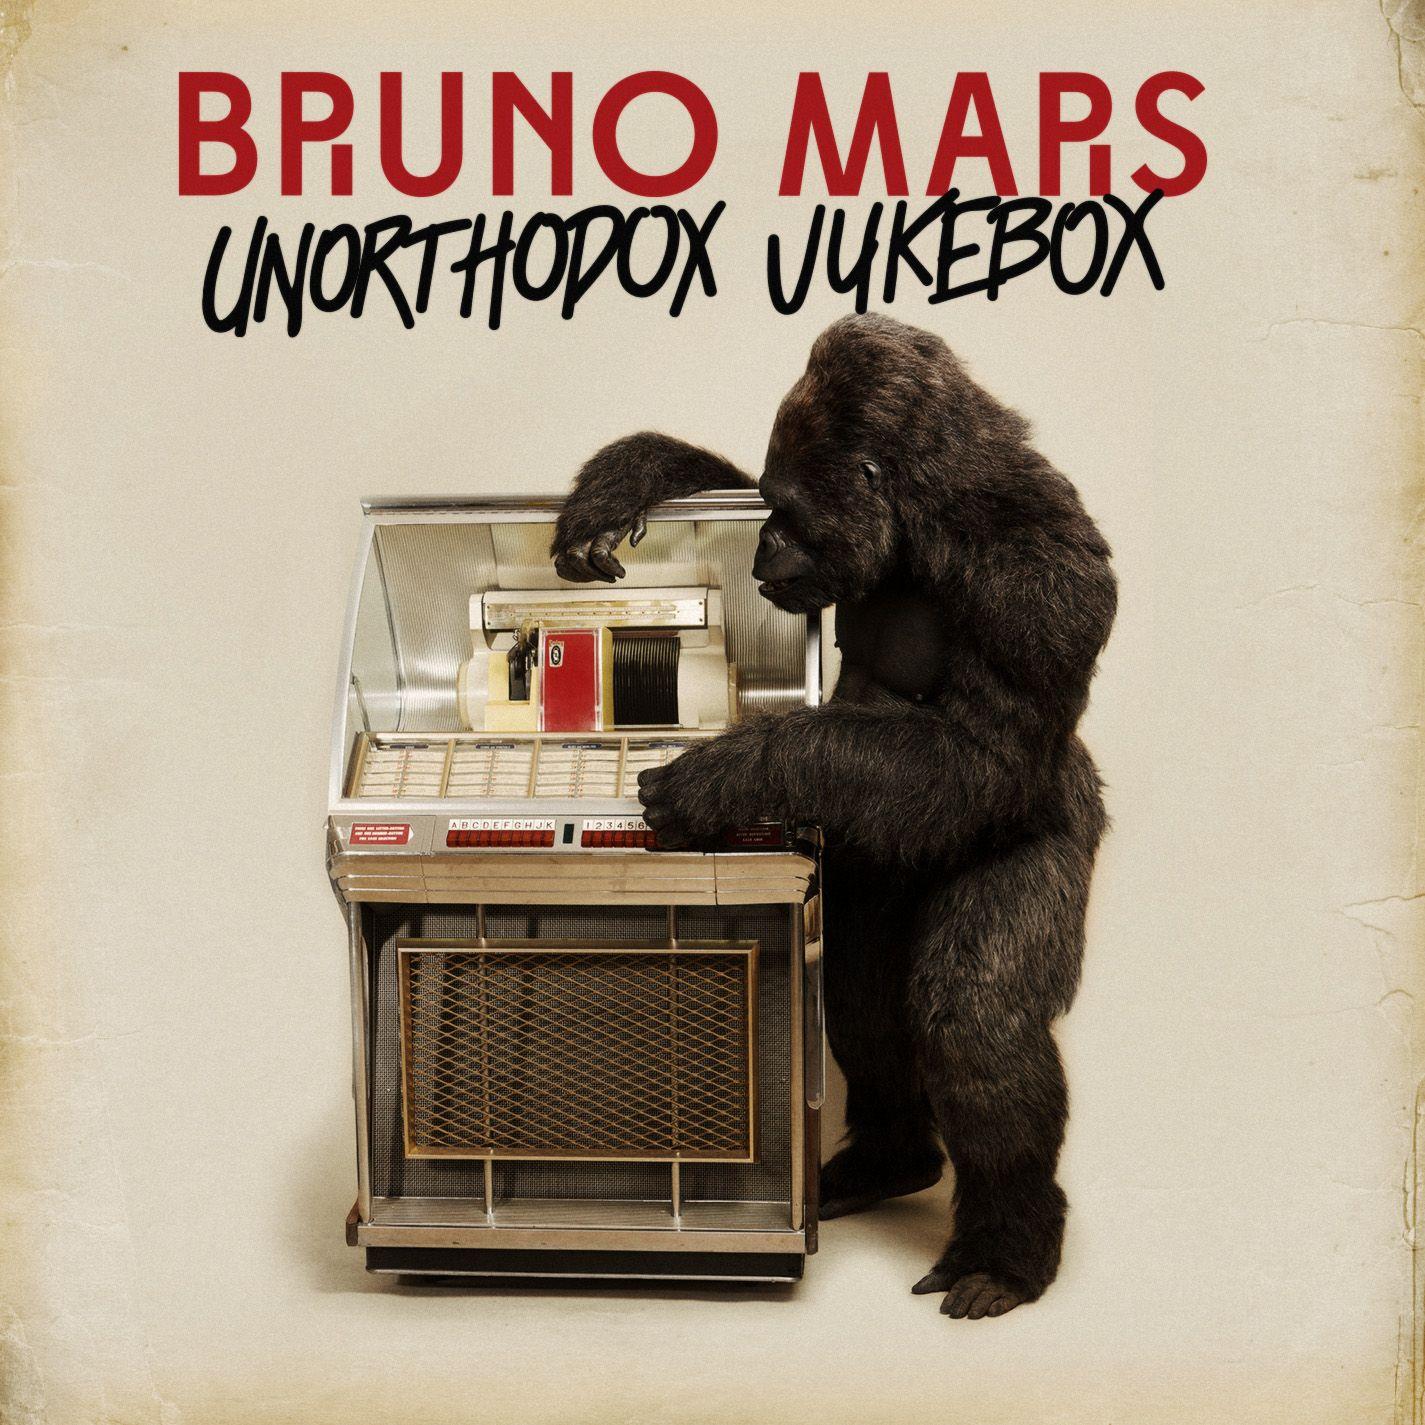 Bruno Mars - Unorthodox Jukebox album cover